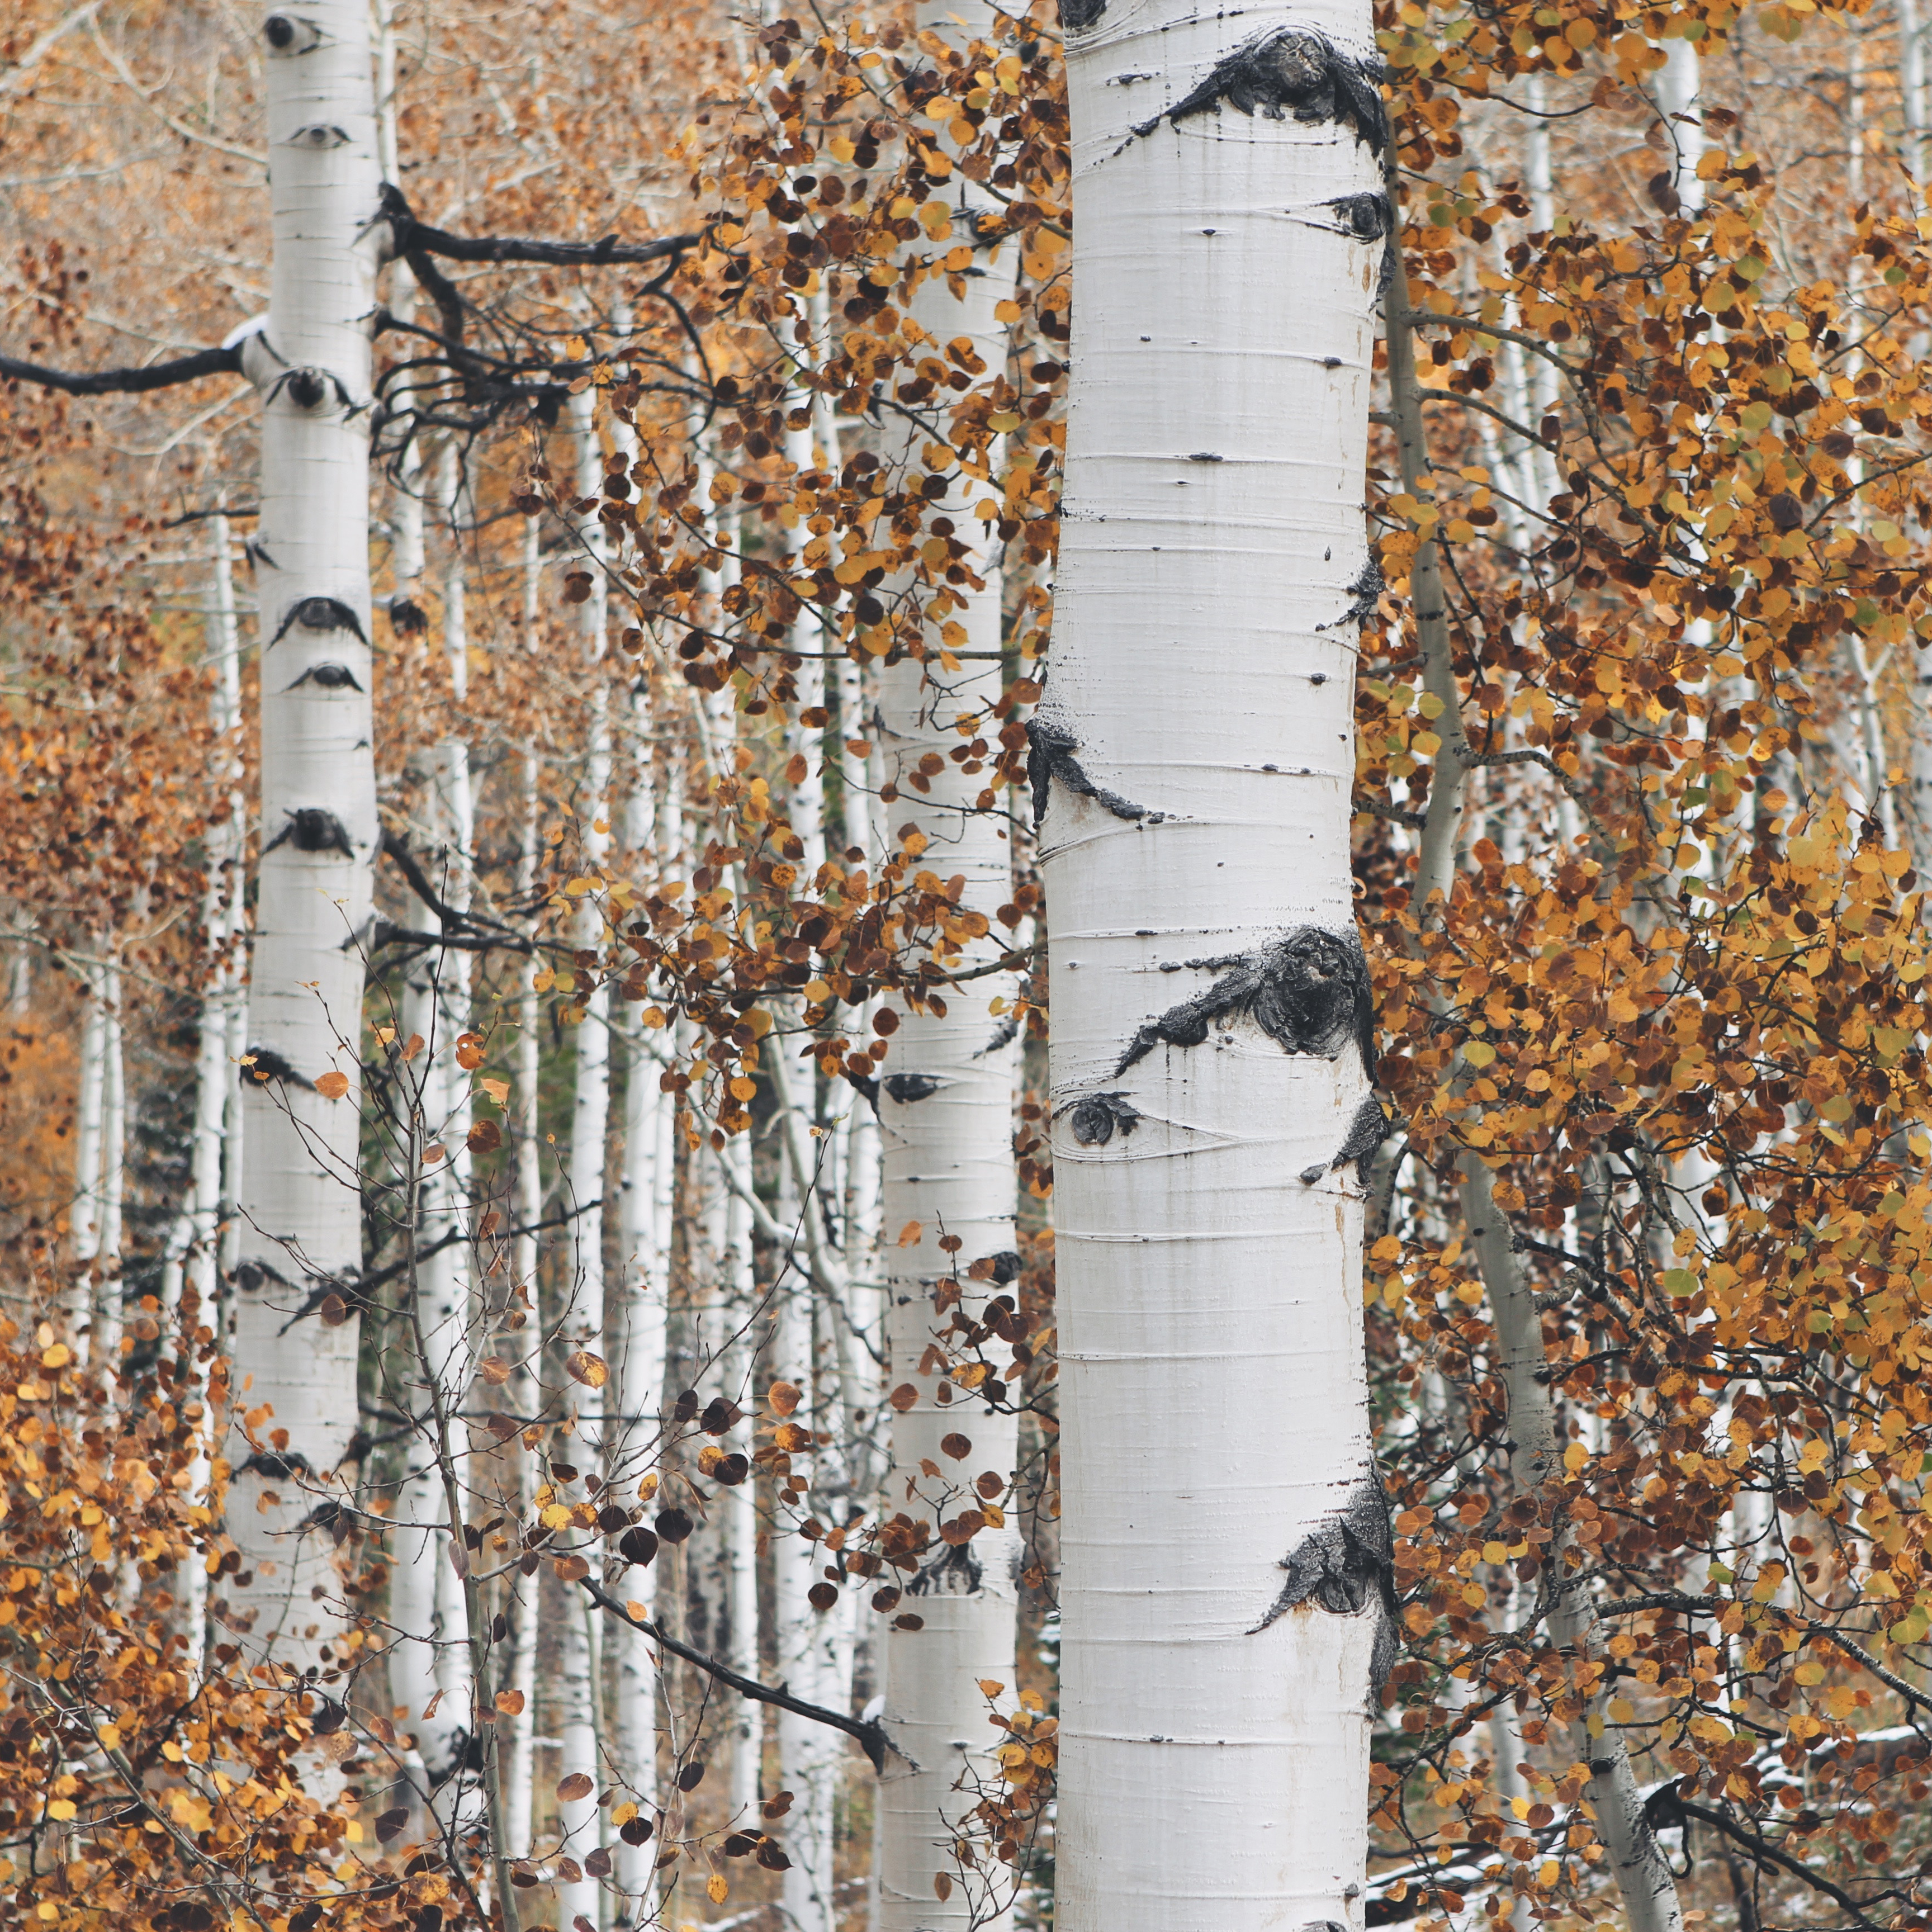 Tarmi's Silver Birch inspiration for her Art Couture Garment Mycelium. Image by John Price of Unsplash